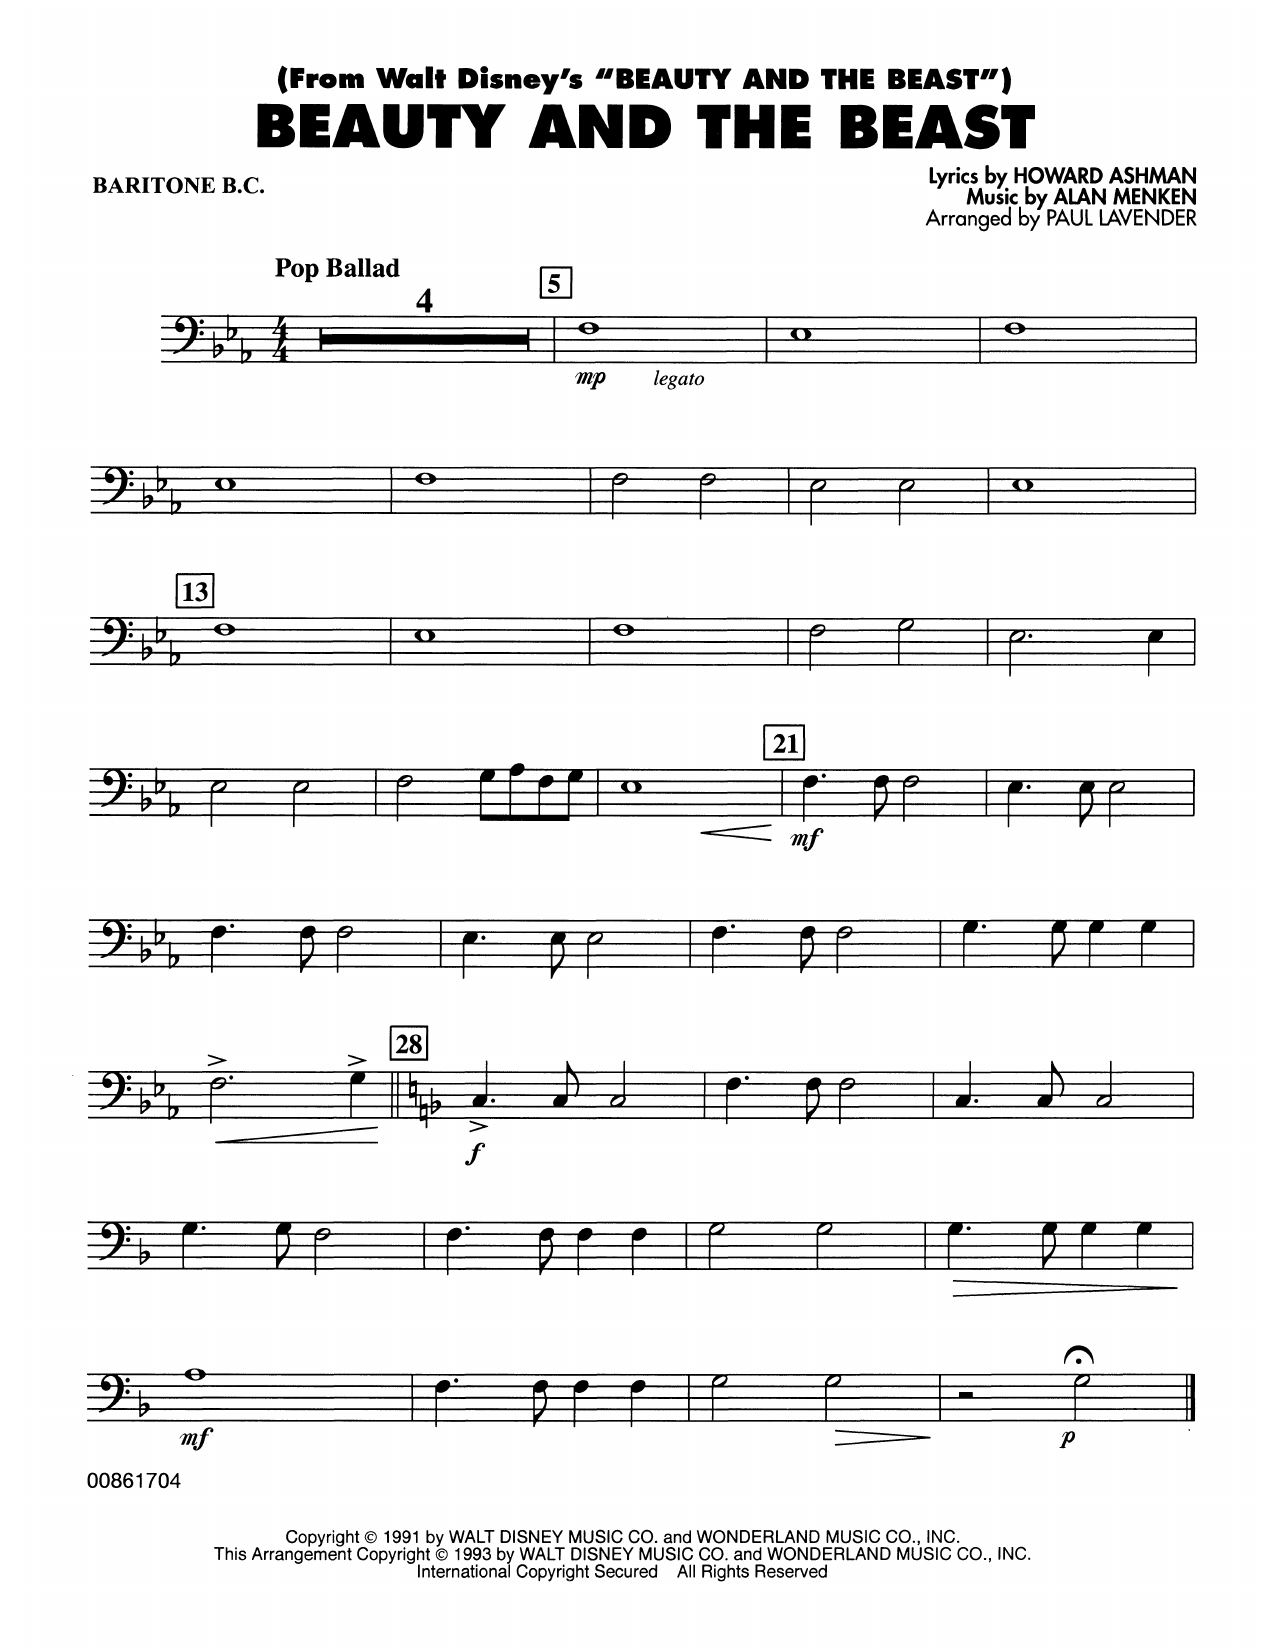 Beauty and the Beast - Baritone B.C. Sheet Music